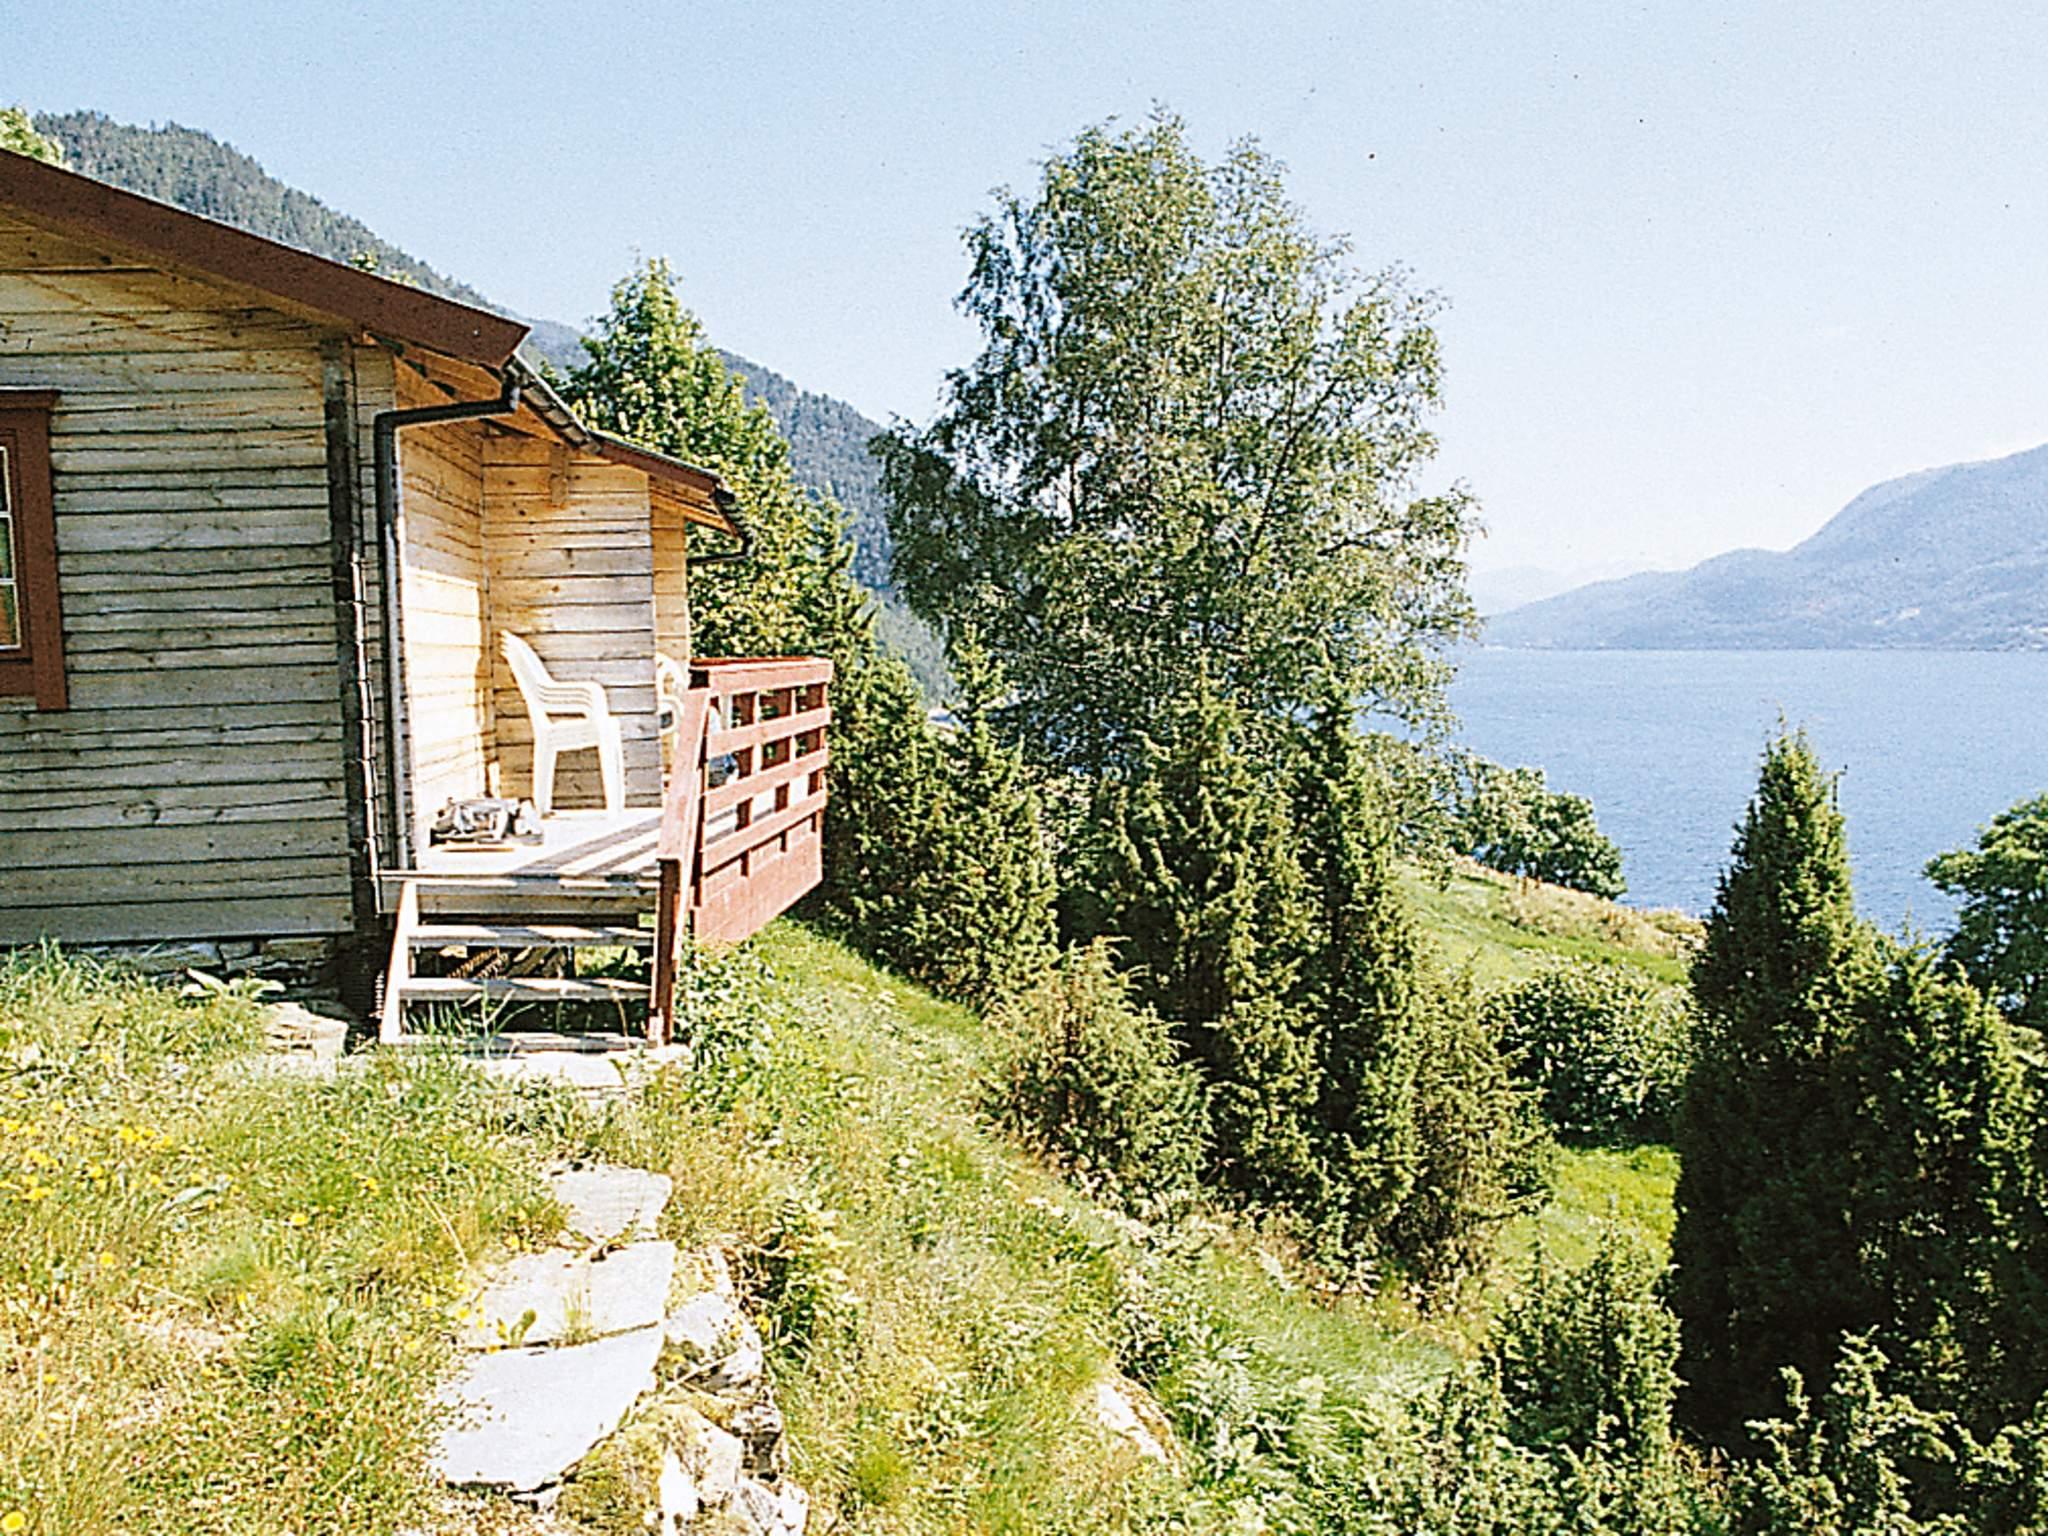 Ferienhaus Heggjabygda (82601), Nordfjordeid, Sognefjord - Nordfjord, Westnorwegen, Norwegen, Bild 1